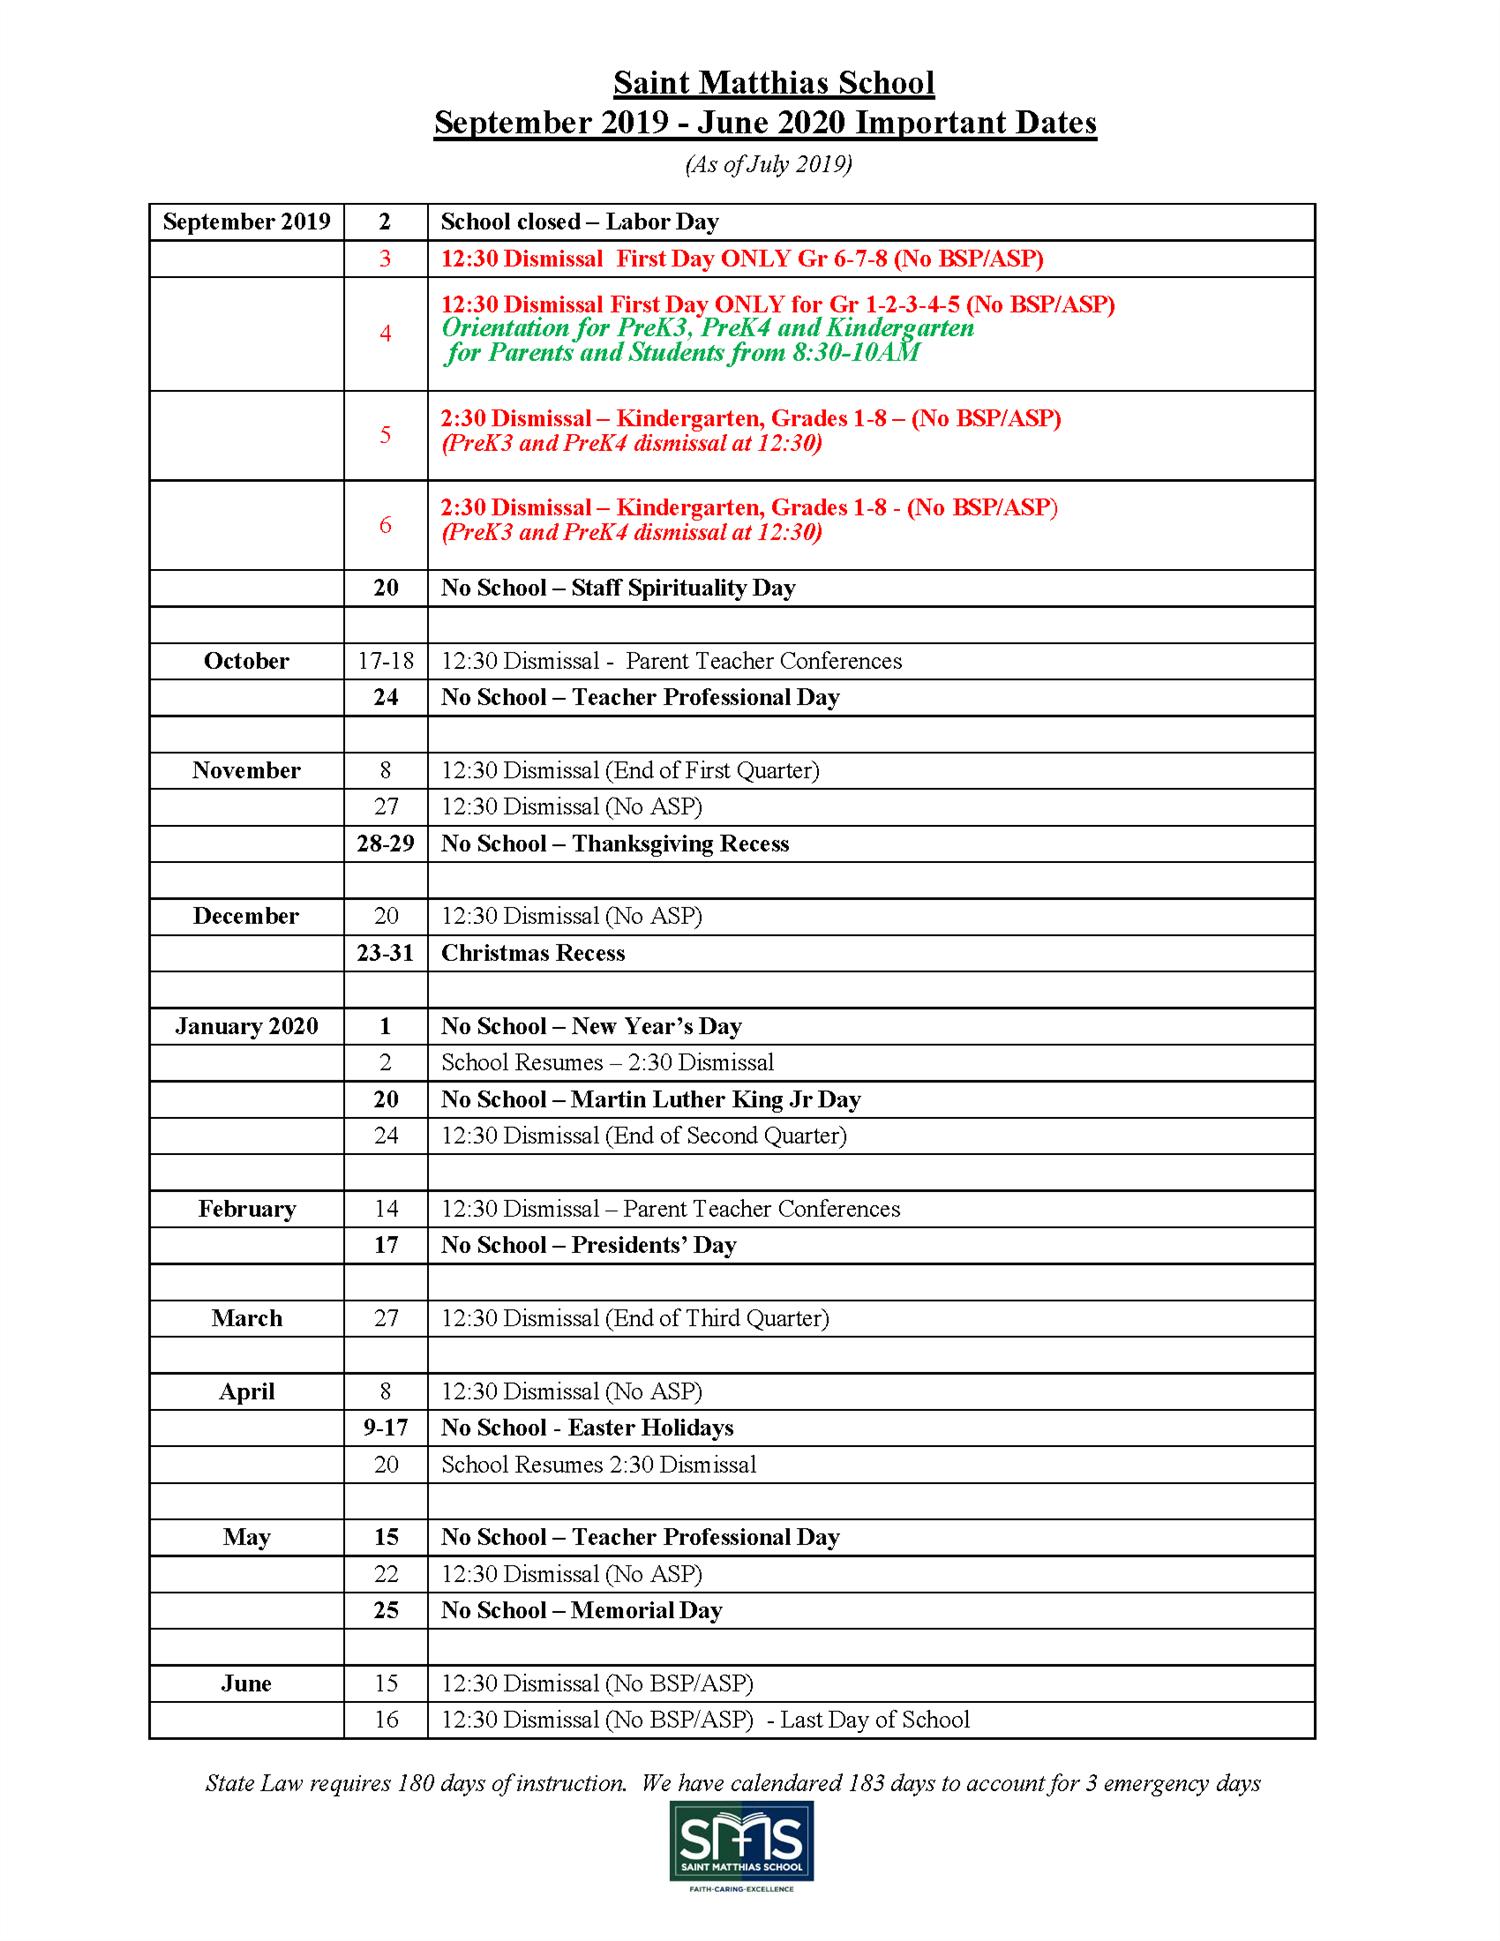 St. Matthias School Calendar - Important Dates For 2019-2020